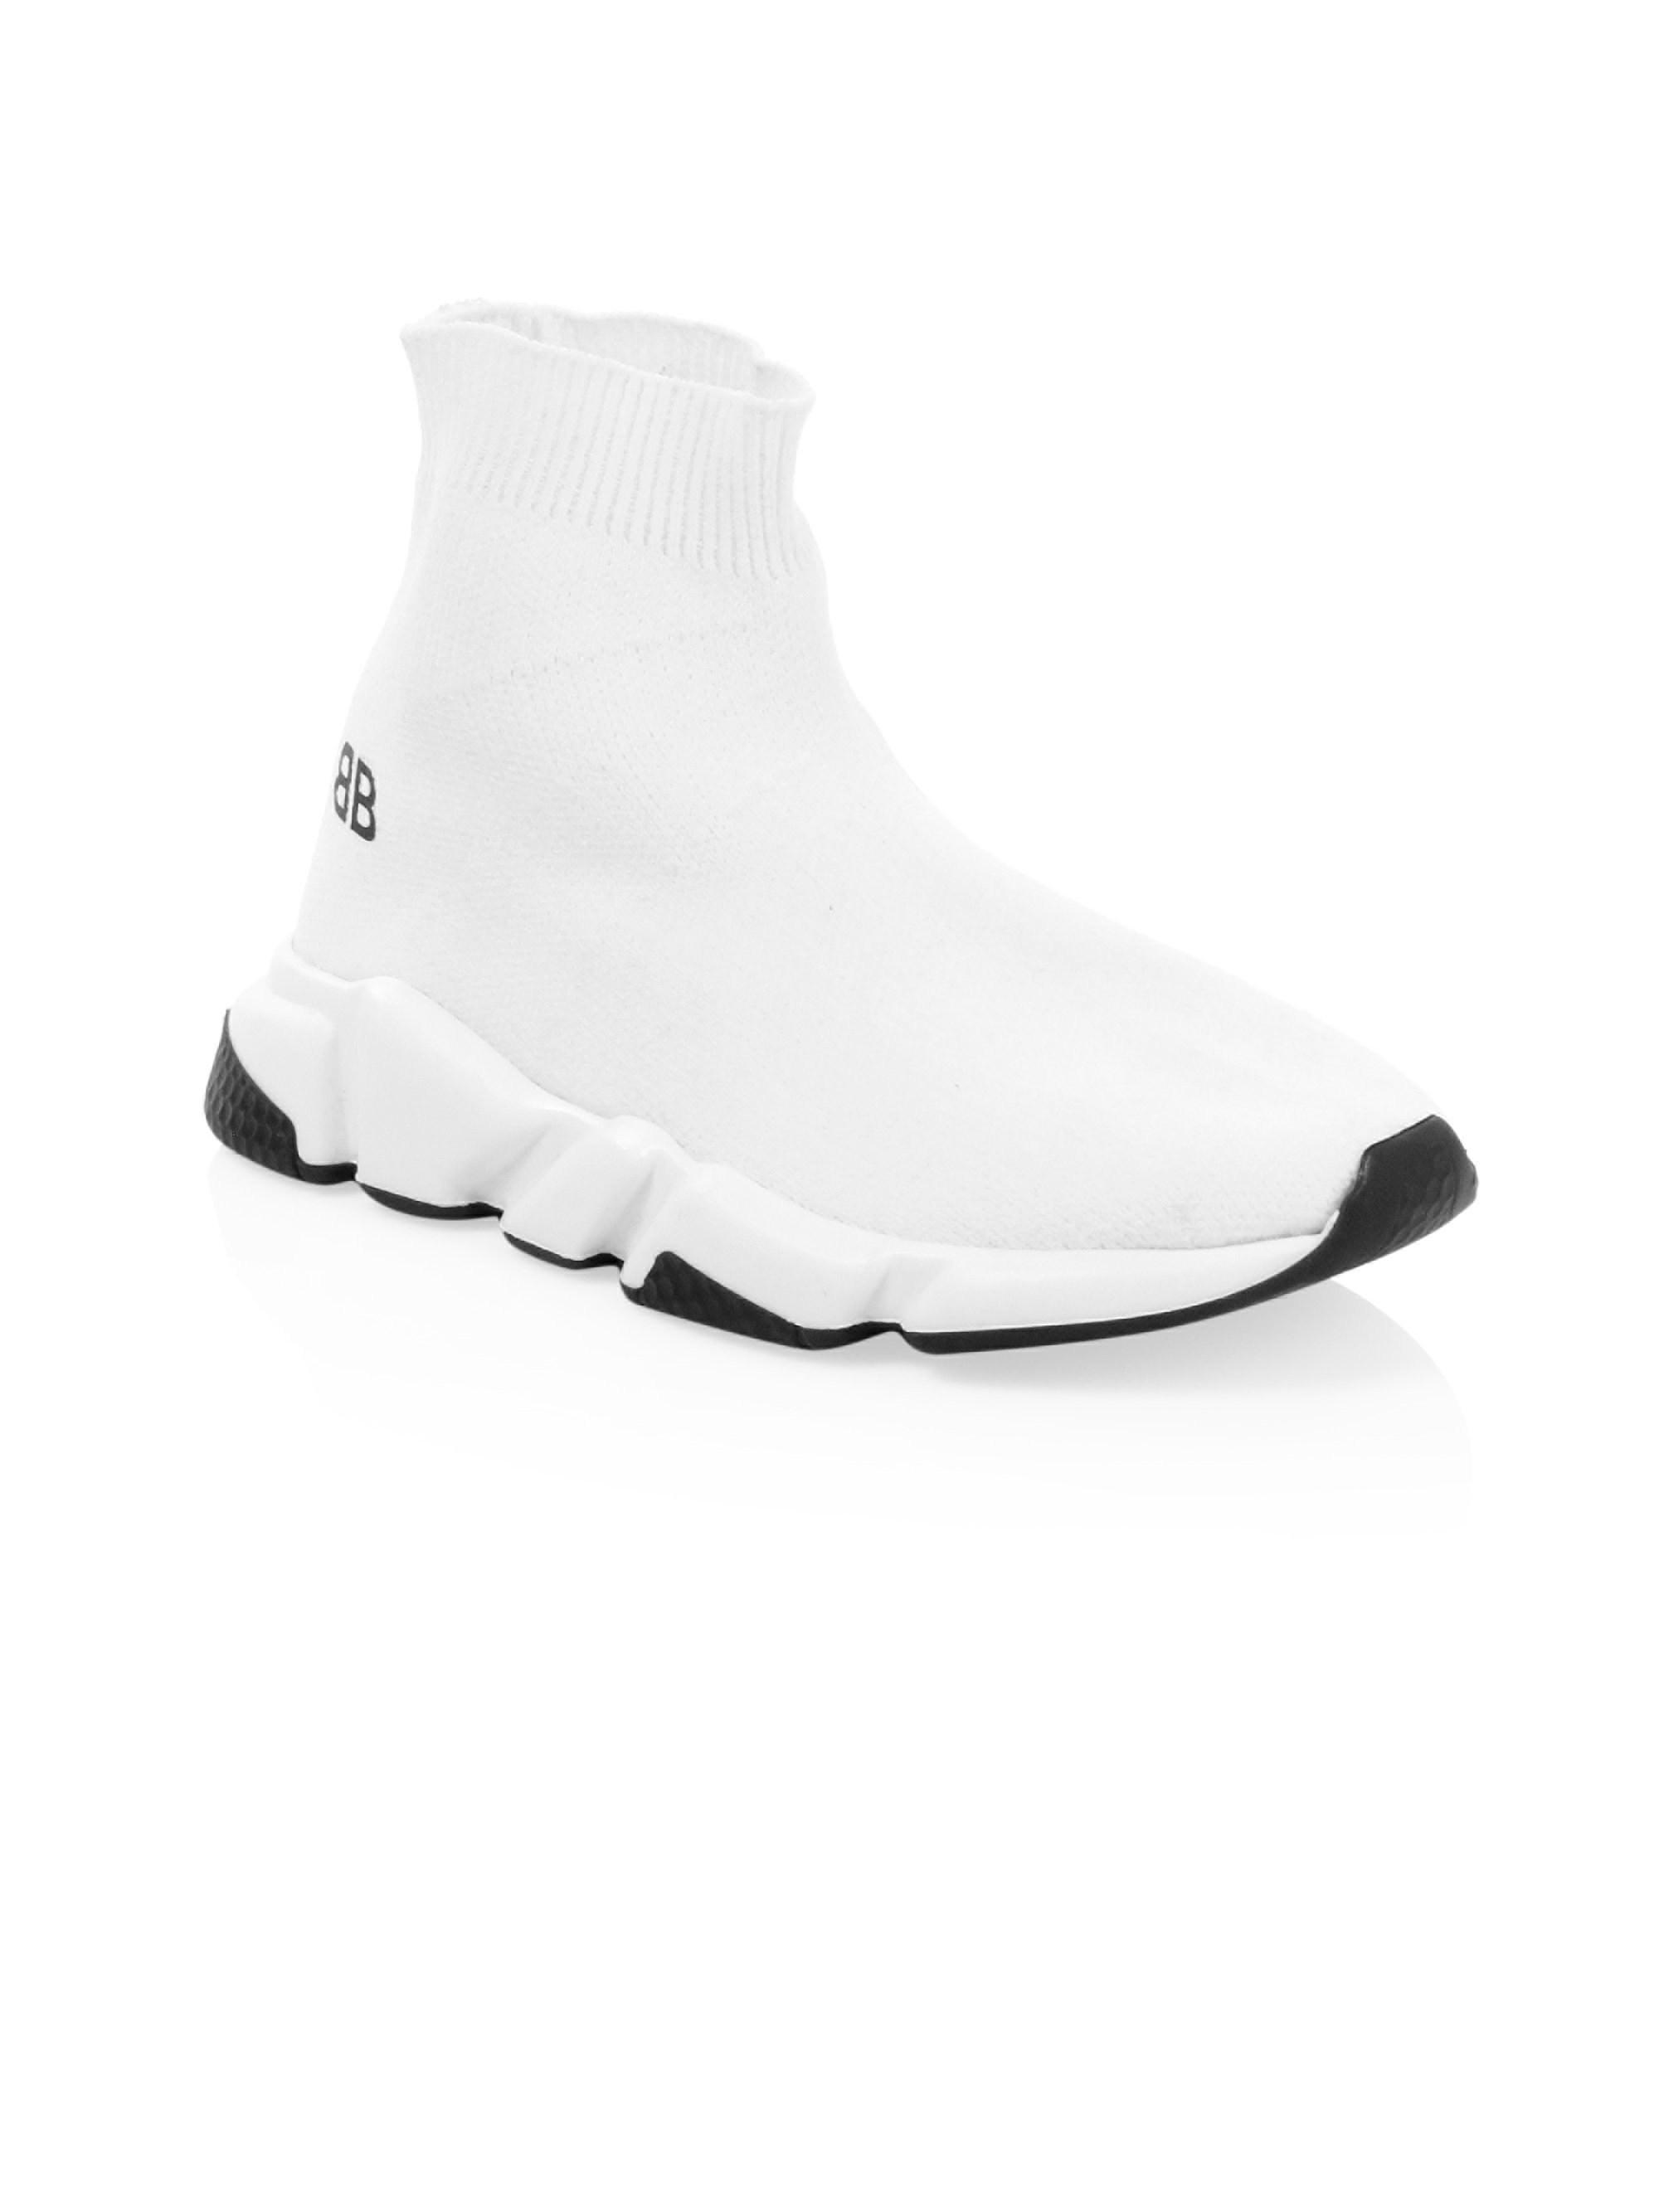 balenciaga kids sock shoes \u003e Up to 63